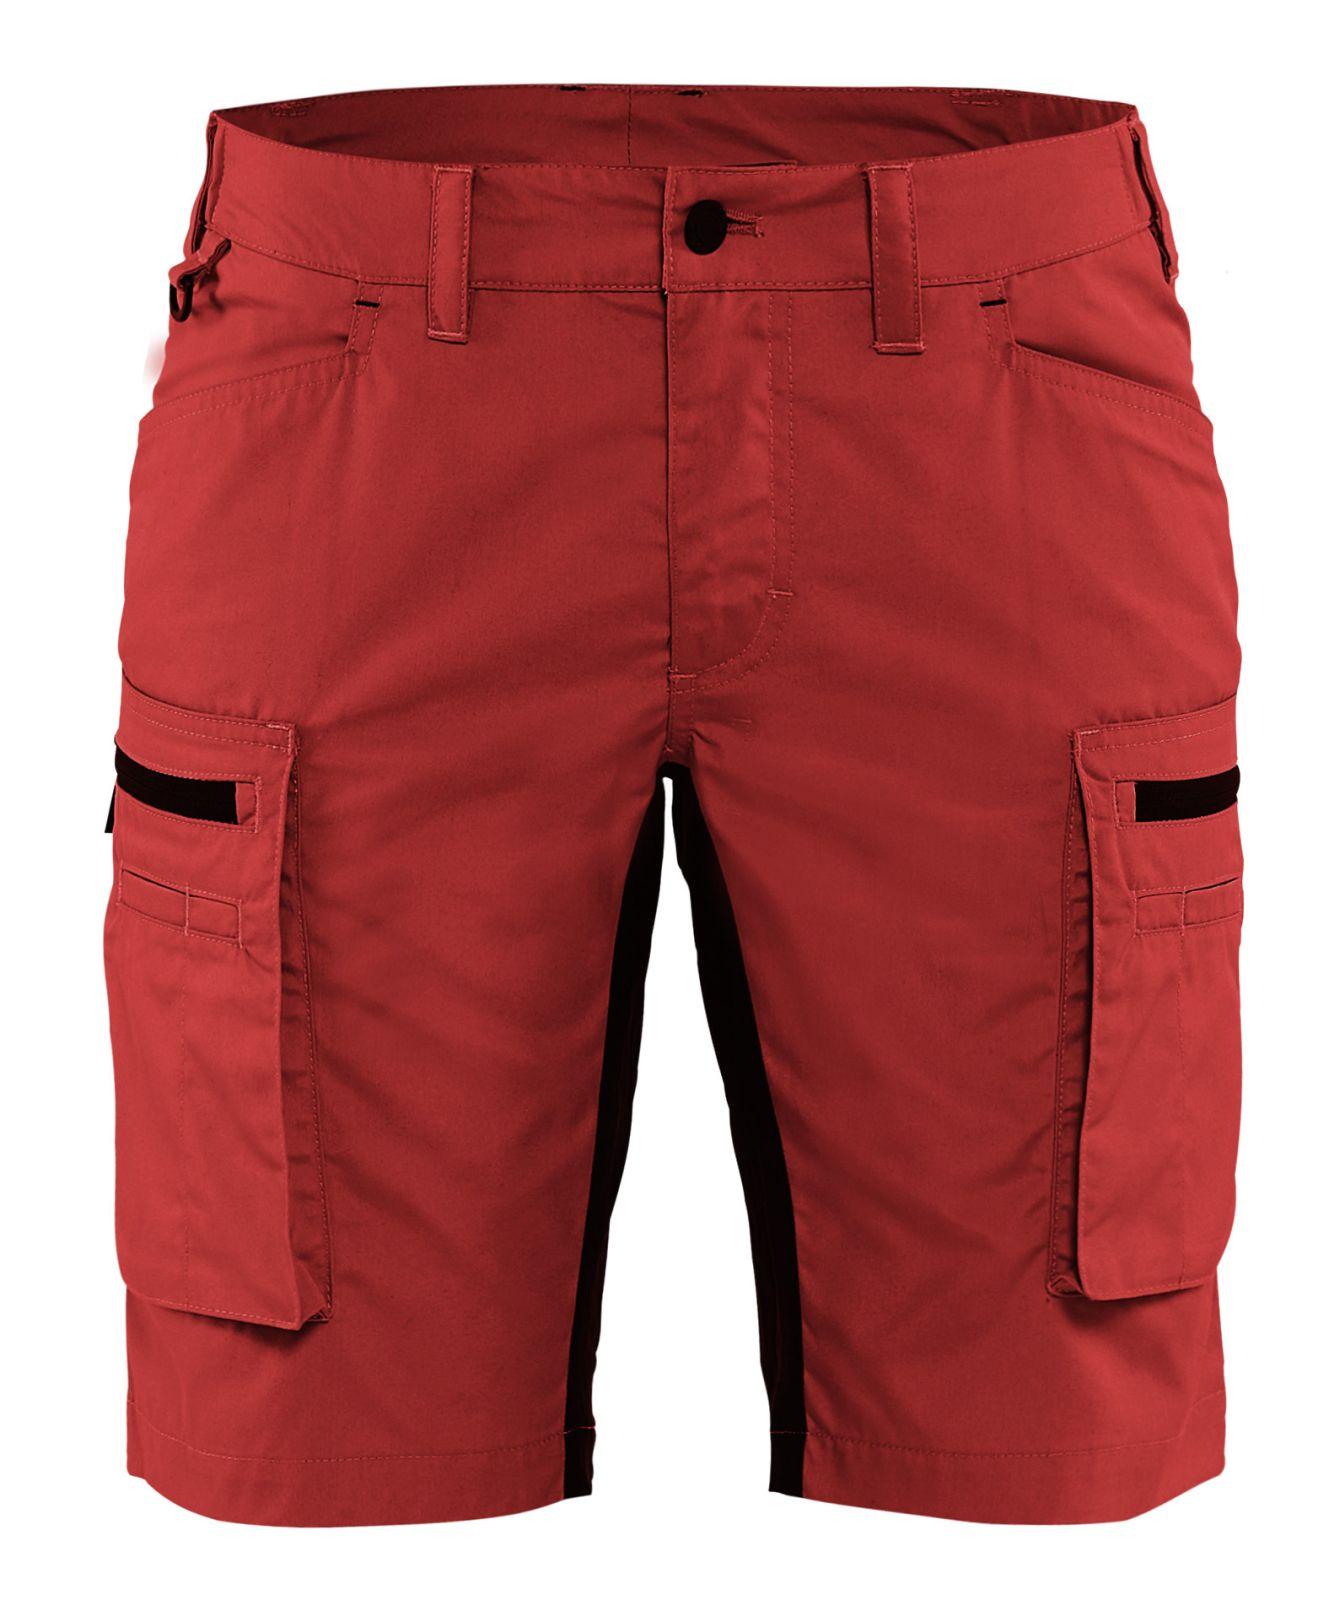 Blaklader Korte dames werkbroeken 71491845 rood-zwart(5699)